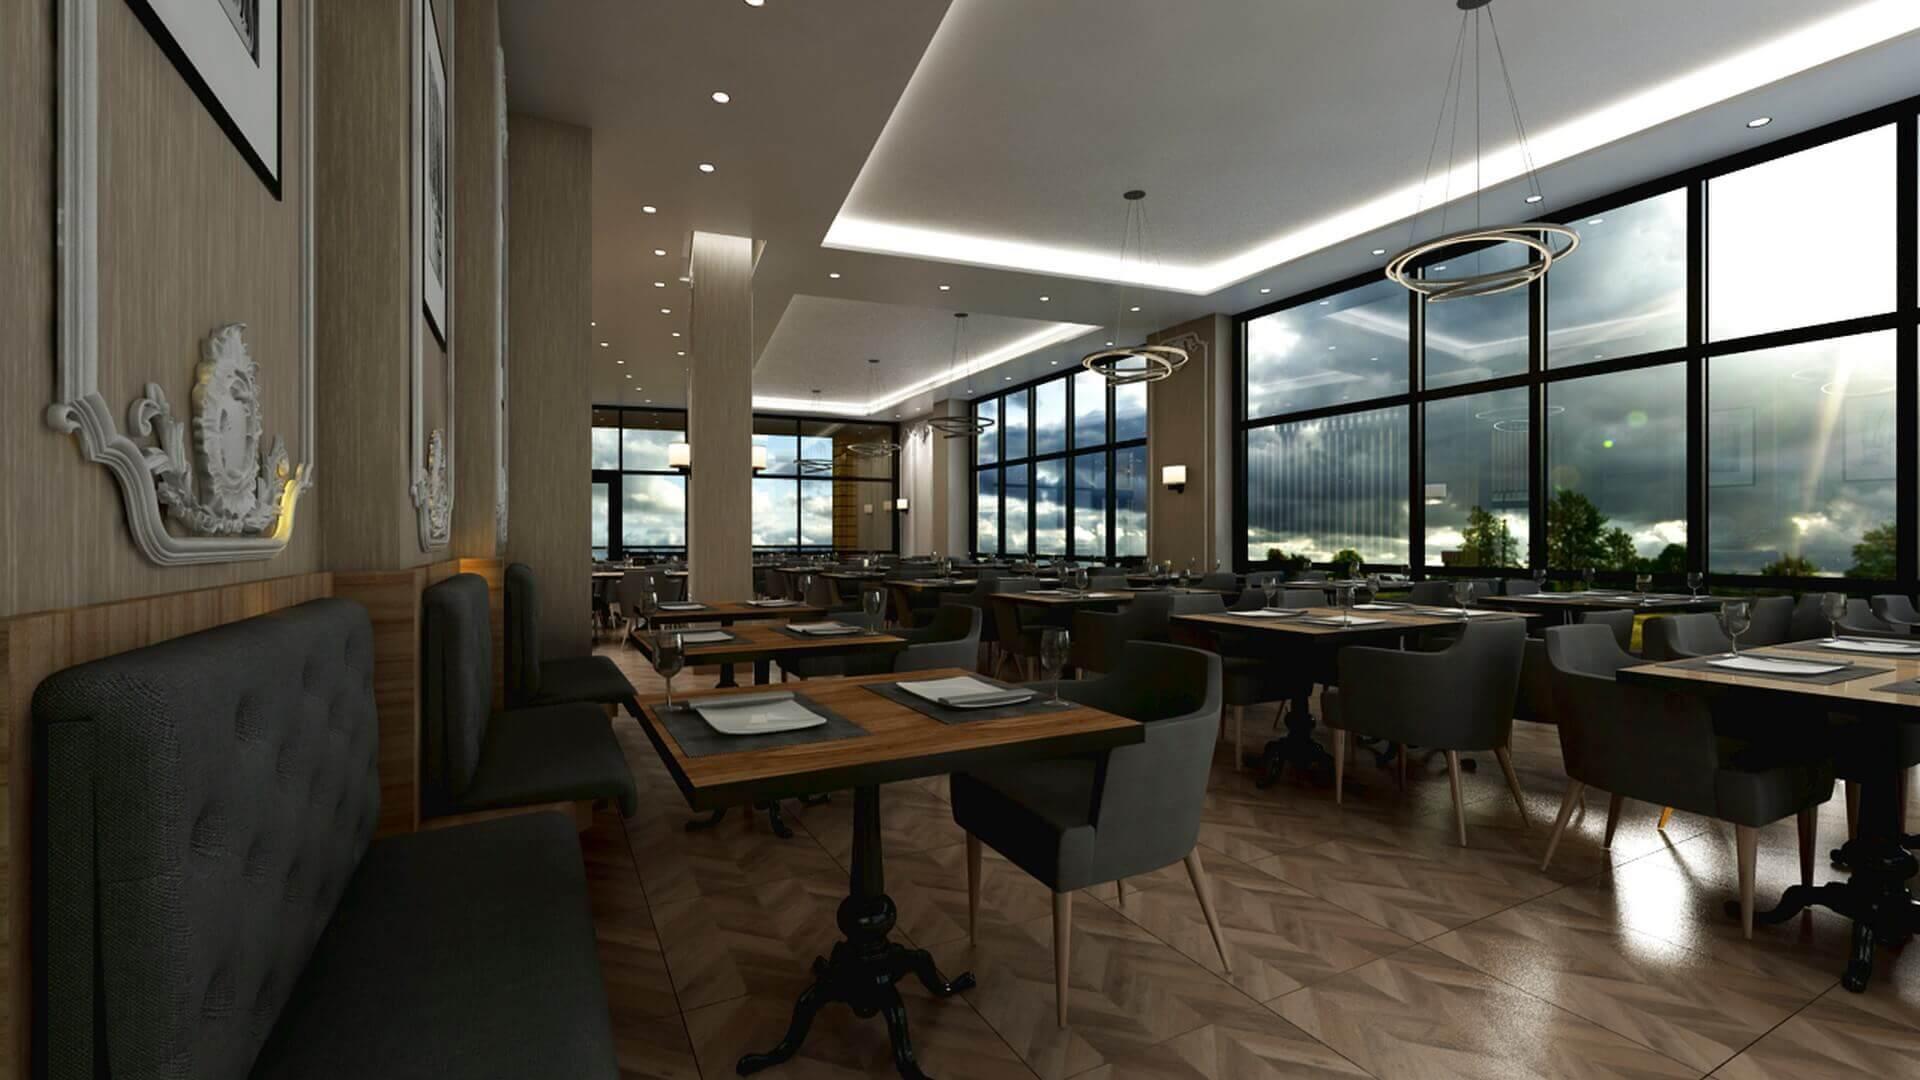 Otonomi 2077 Otonomi Restoran Restoranlar